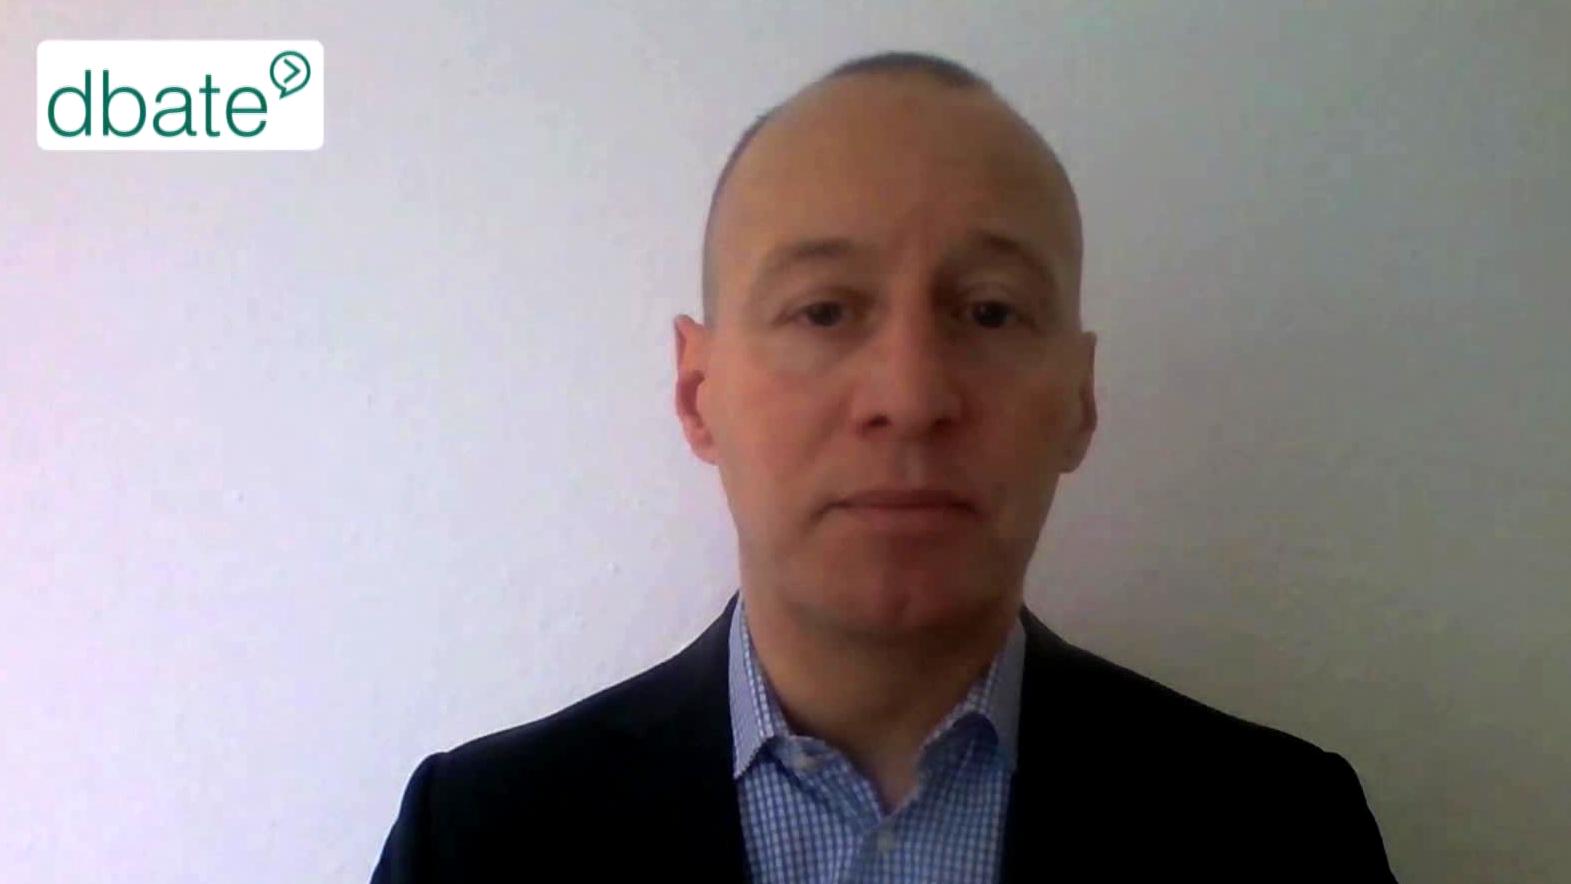 dbate.de_Screenshot_Skype-Talk_Michael Kauch_FDP_2014_1